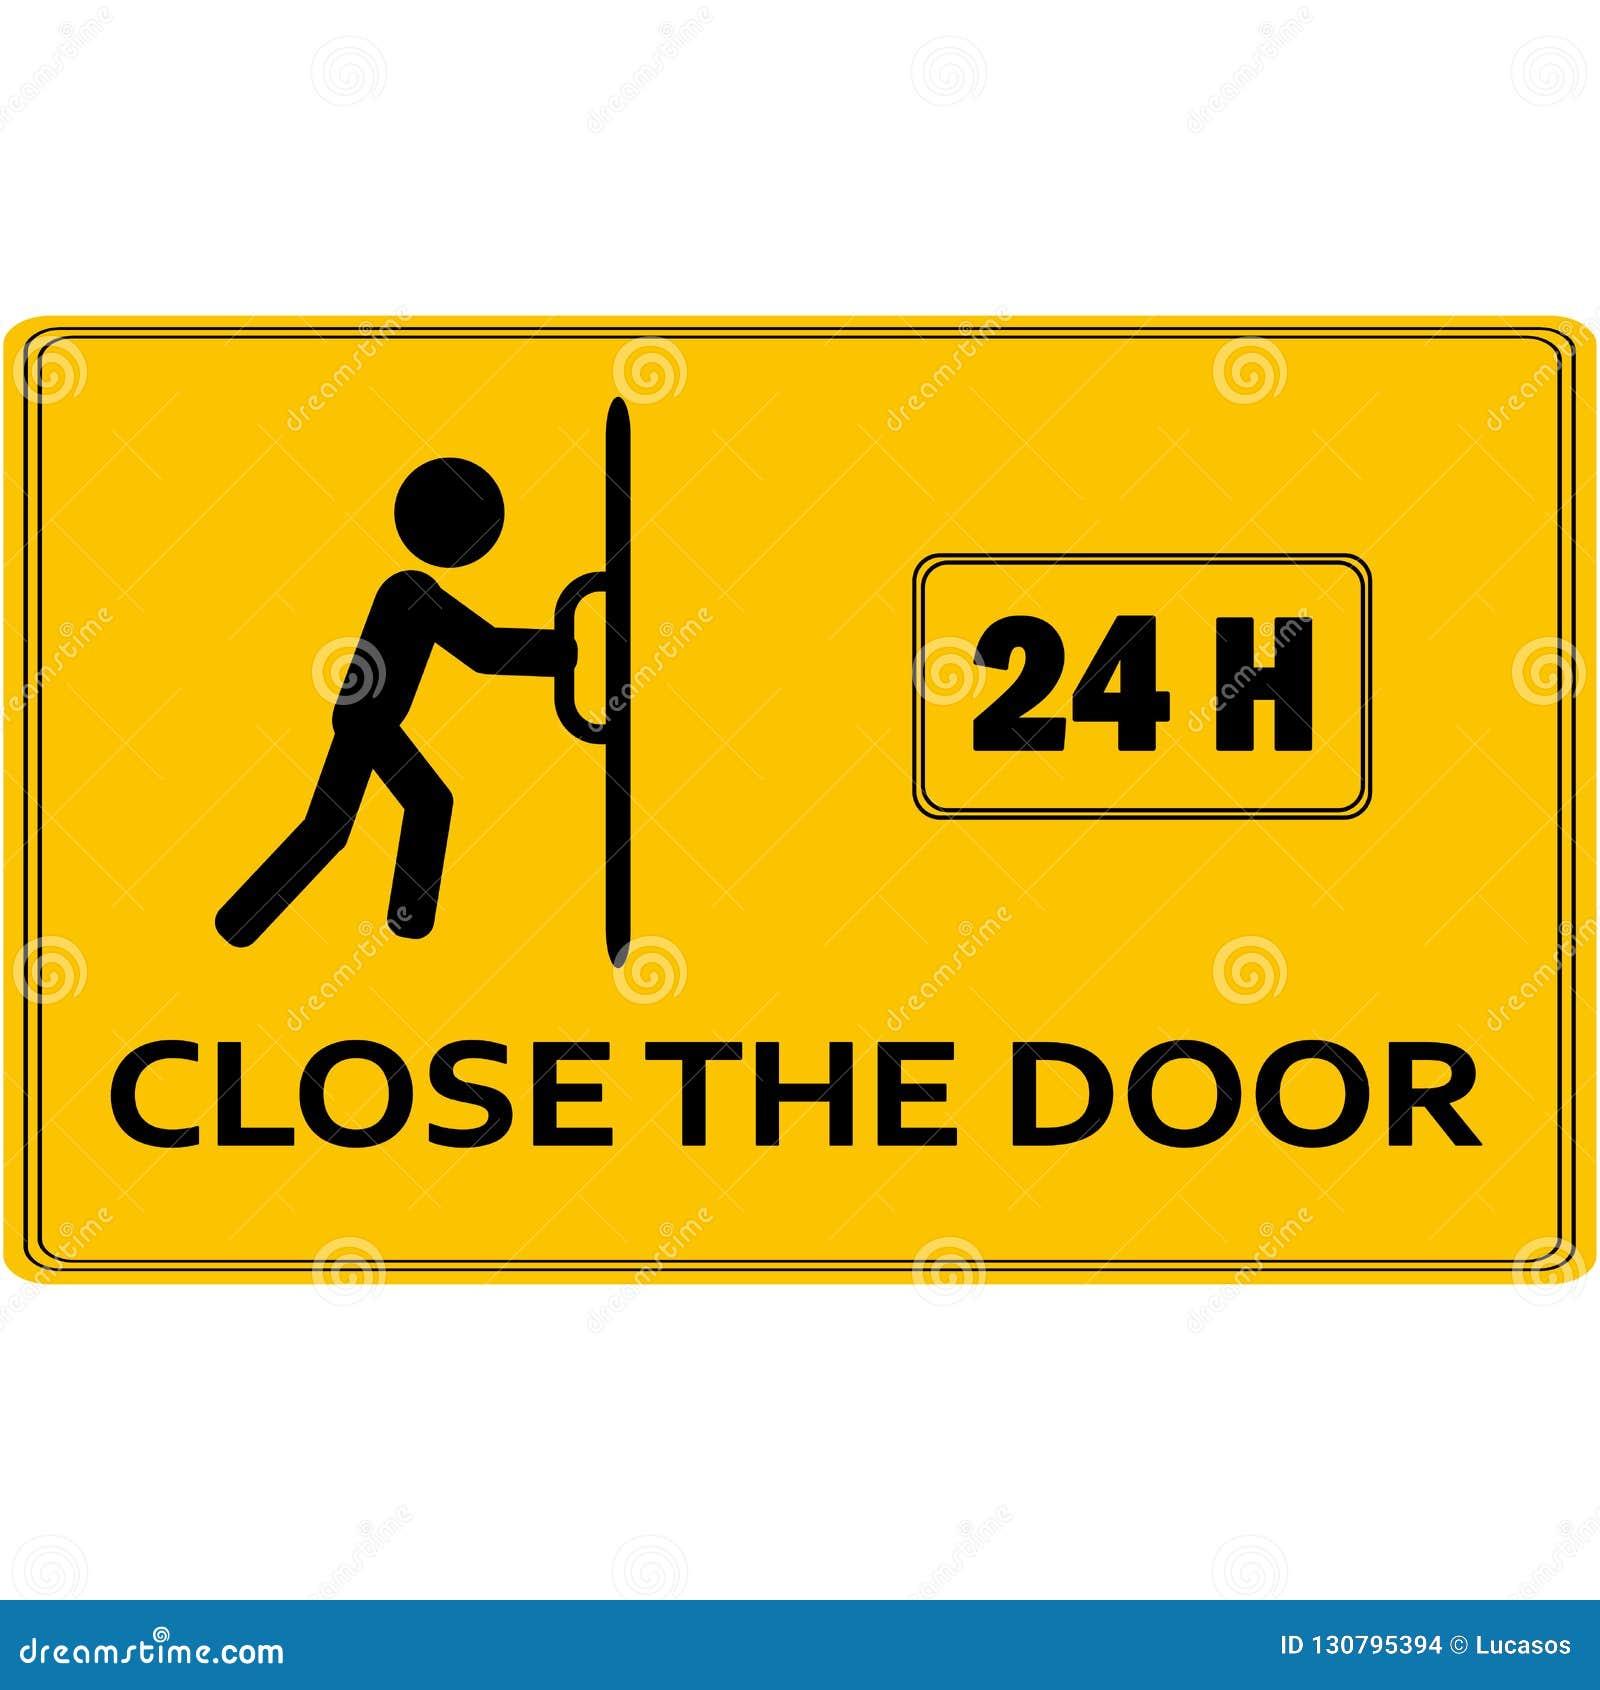 Close The Door >> Close The Door Sign Stock Vector Illustration Of Interior 130795394